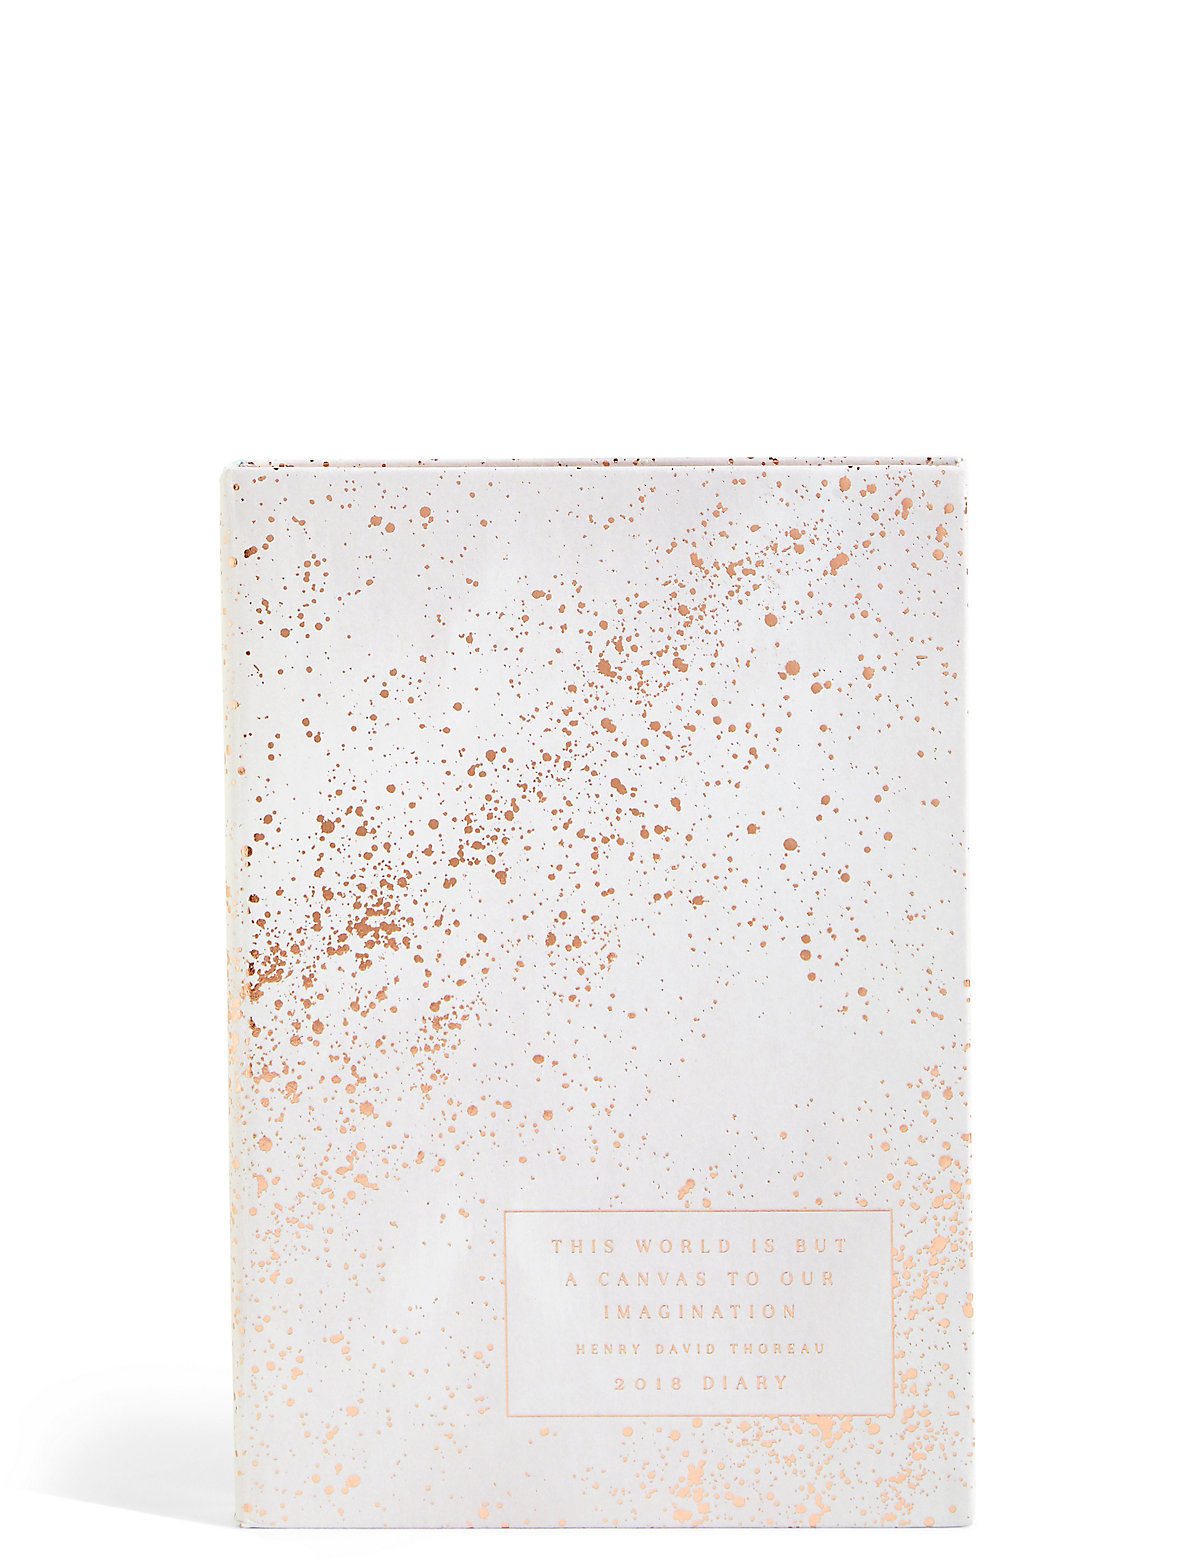 Small Foil Spot 2018 Diary